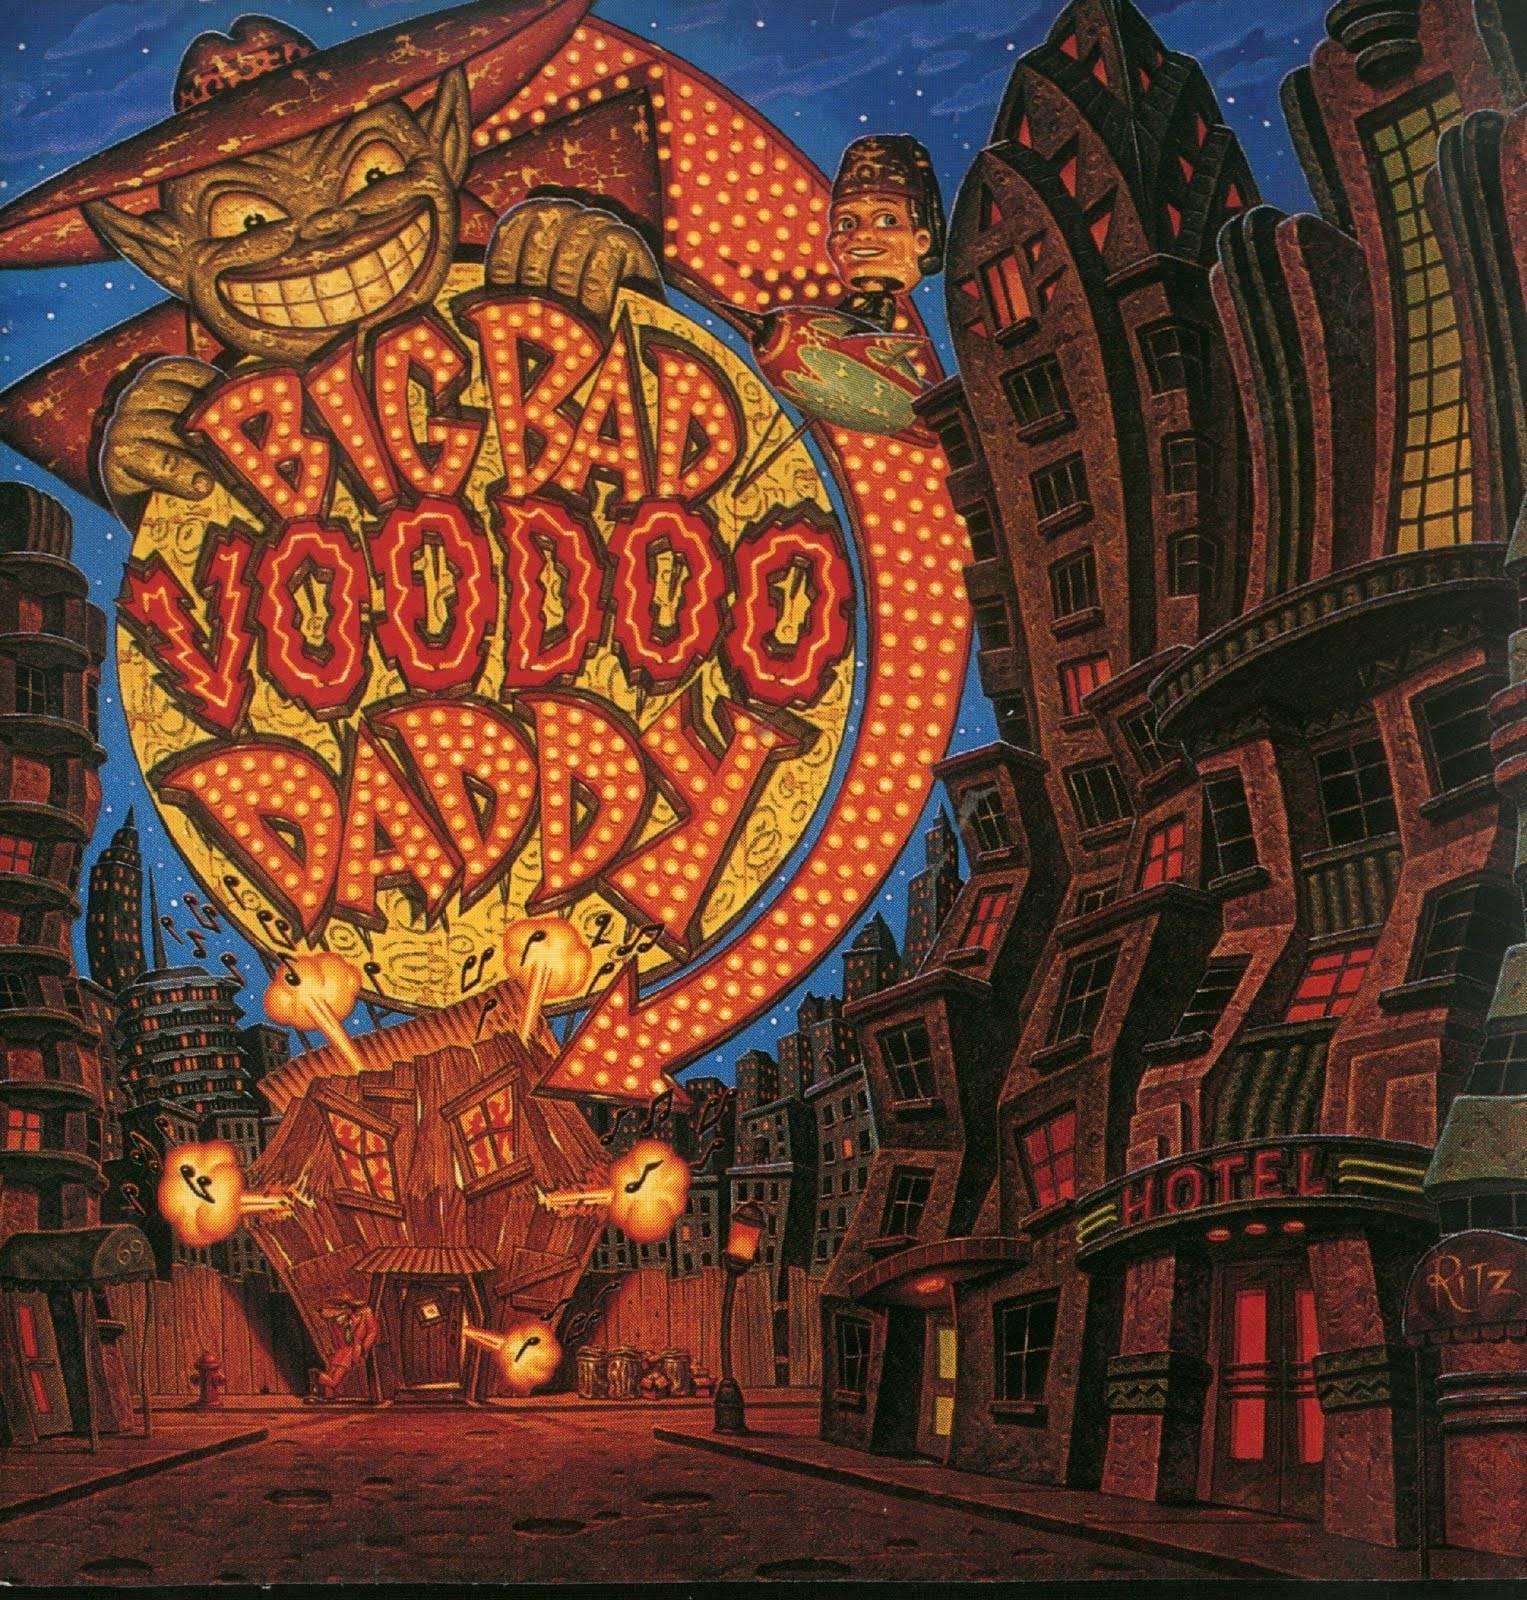 big_bad_voodoo_daddy_-_americana_deluxe-2.jpg